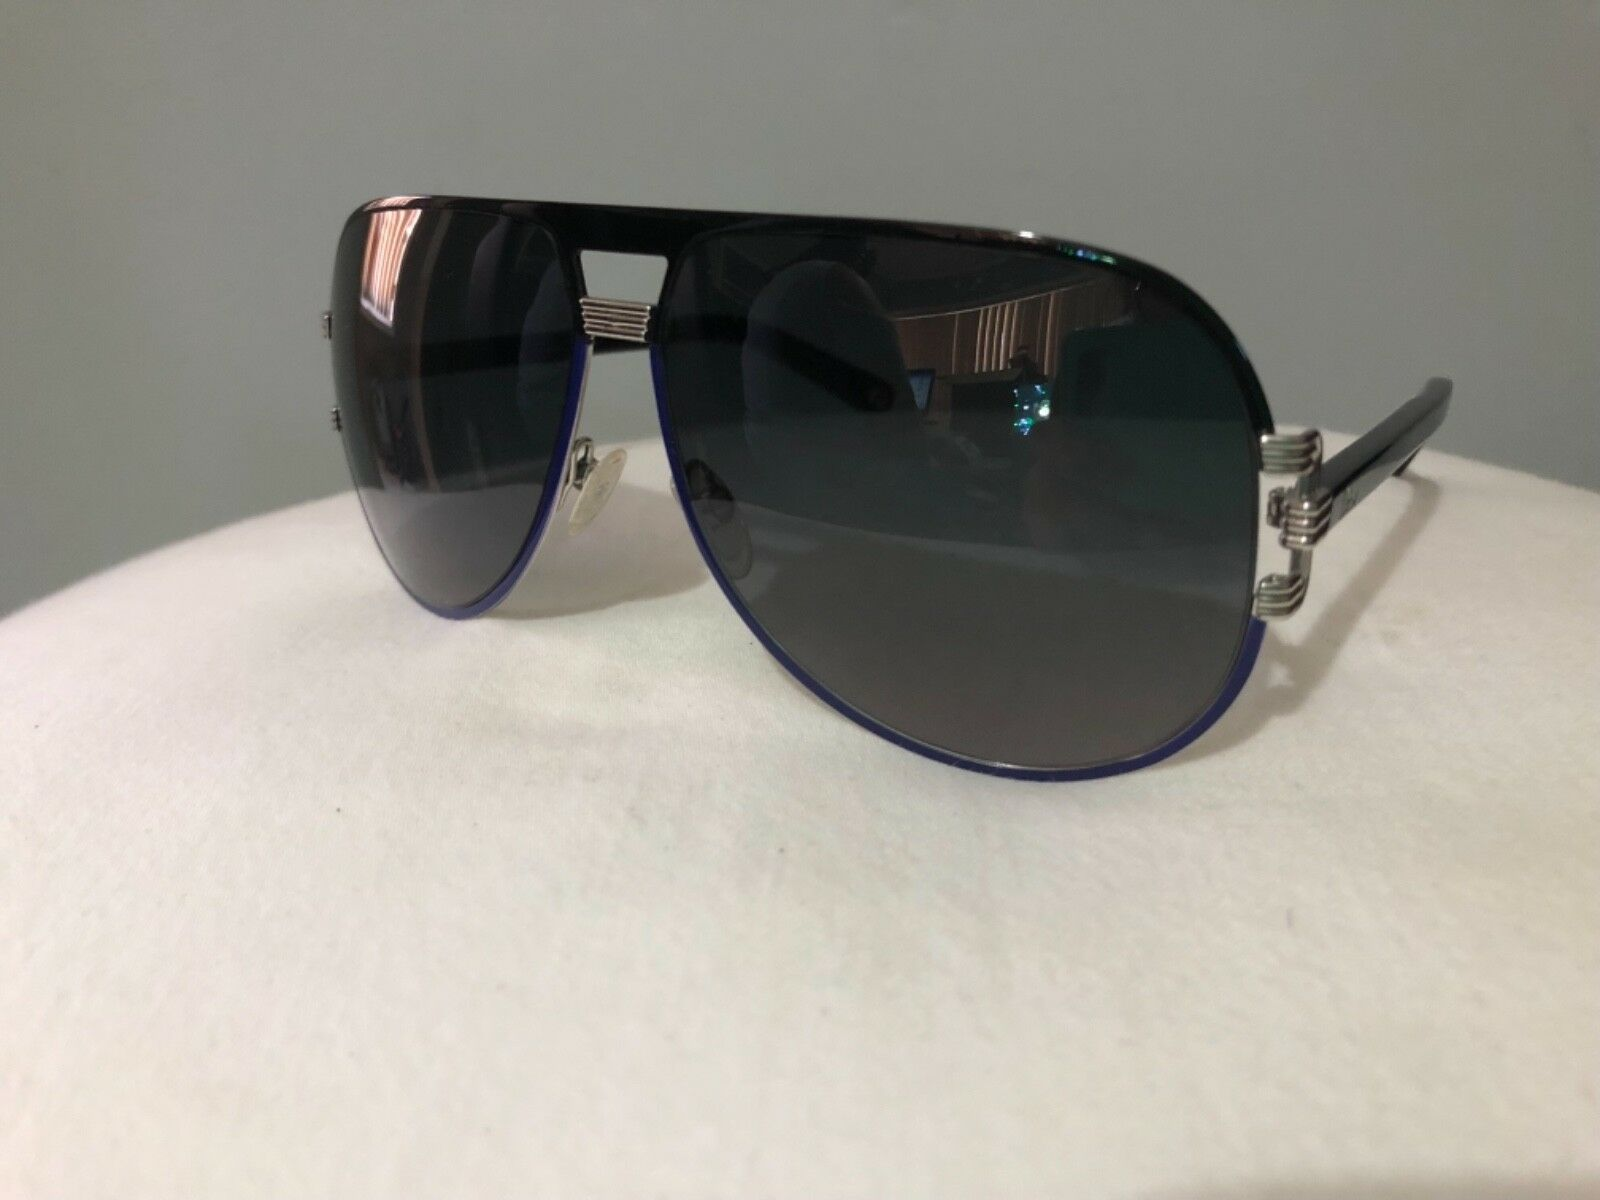 AUTHENTIC Christian Dior Sunglasses graphix 2 Aviator blue black silver teardrop